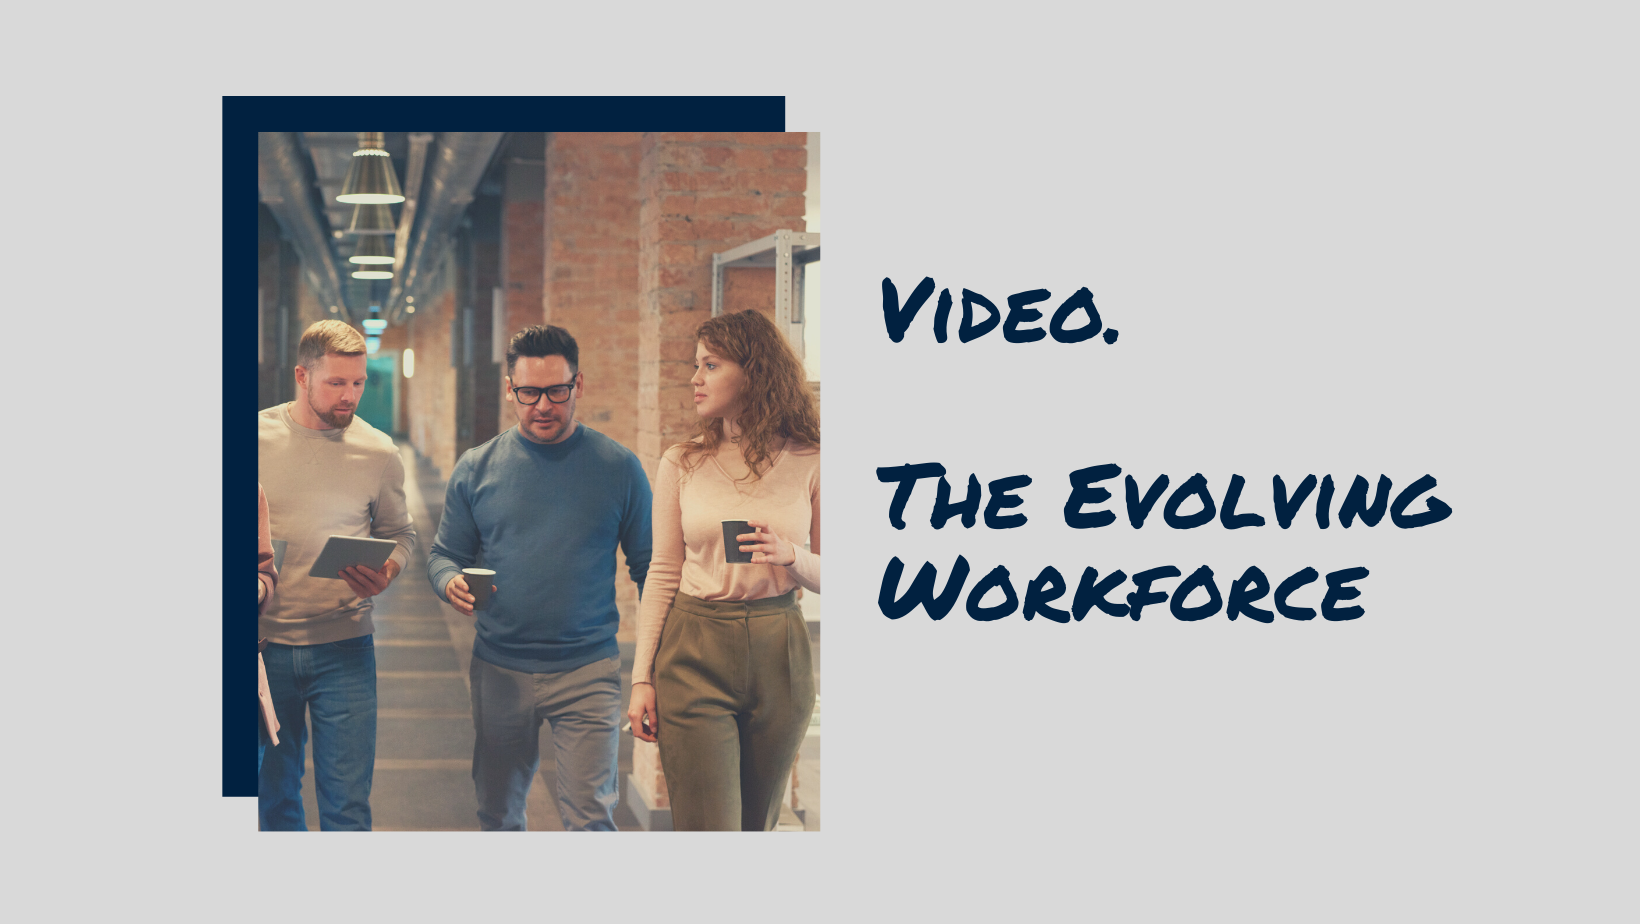 The Evolving Workforce